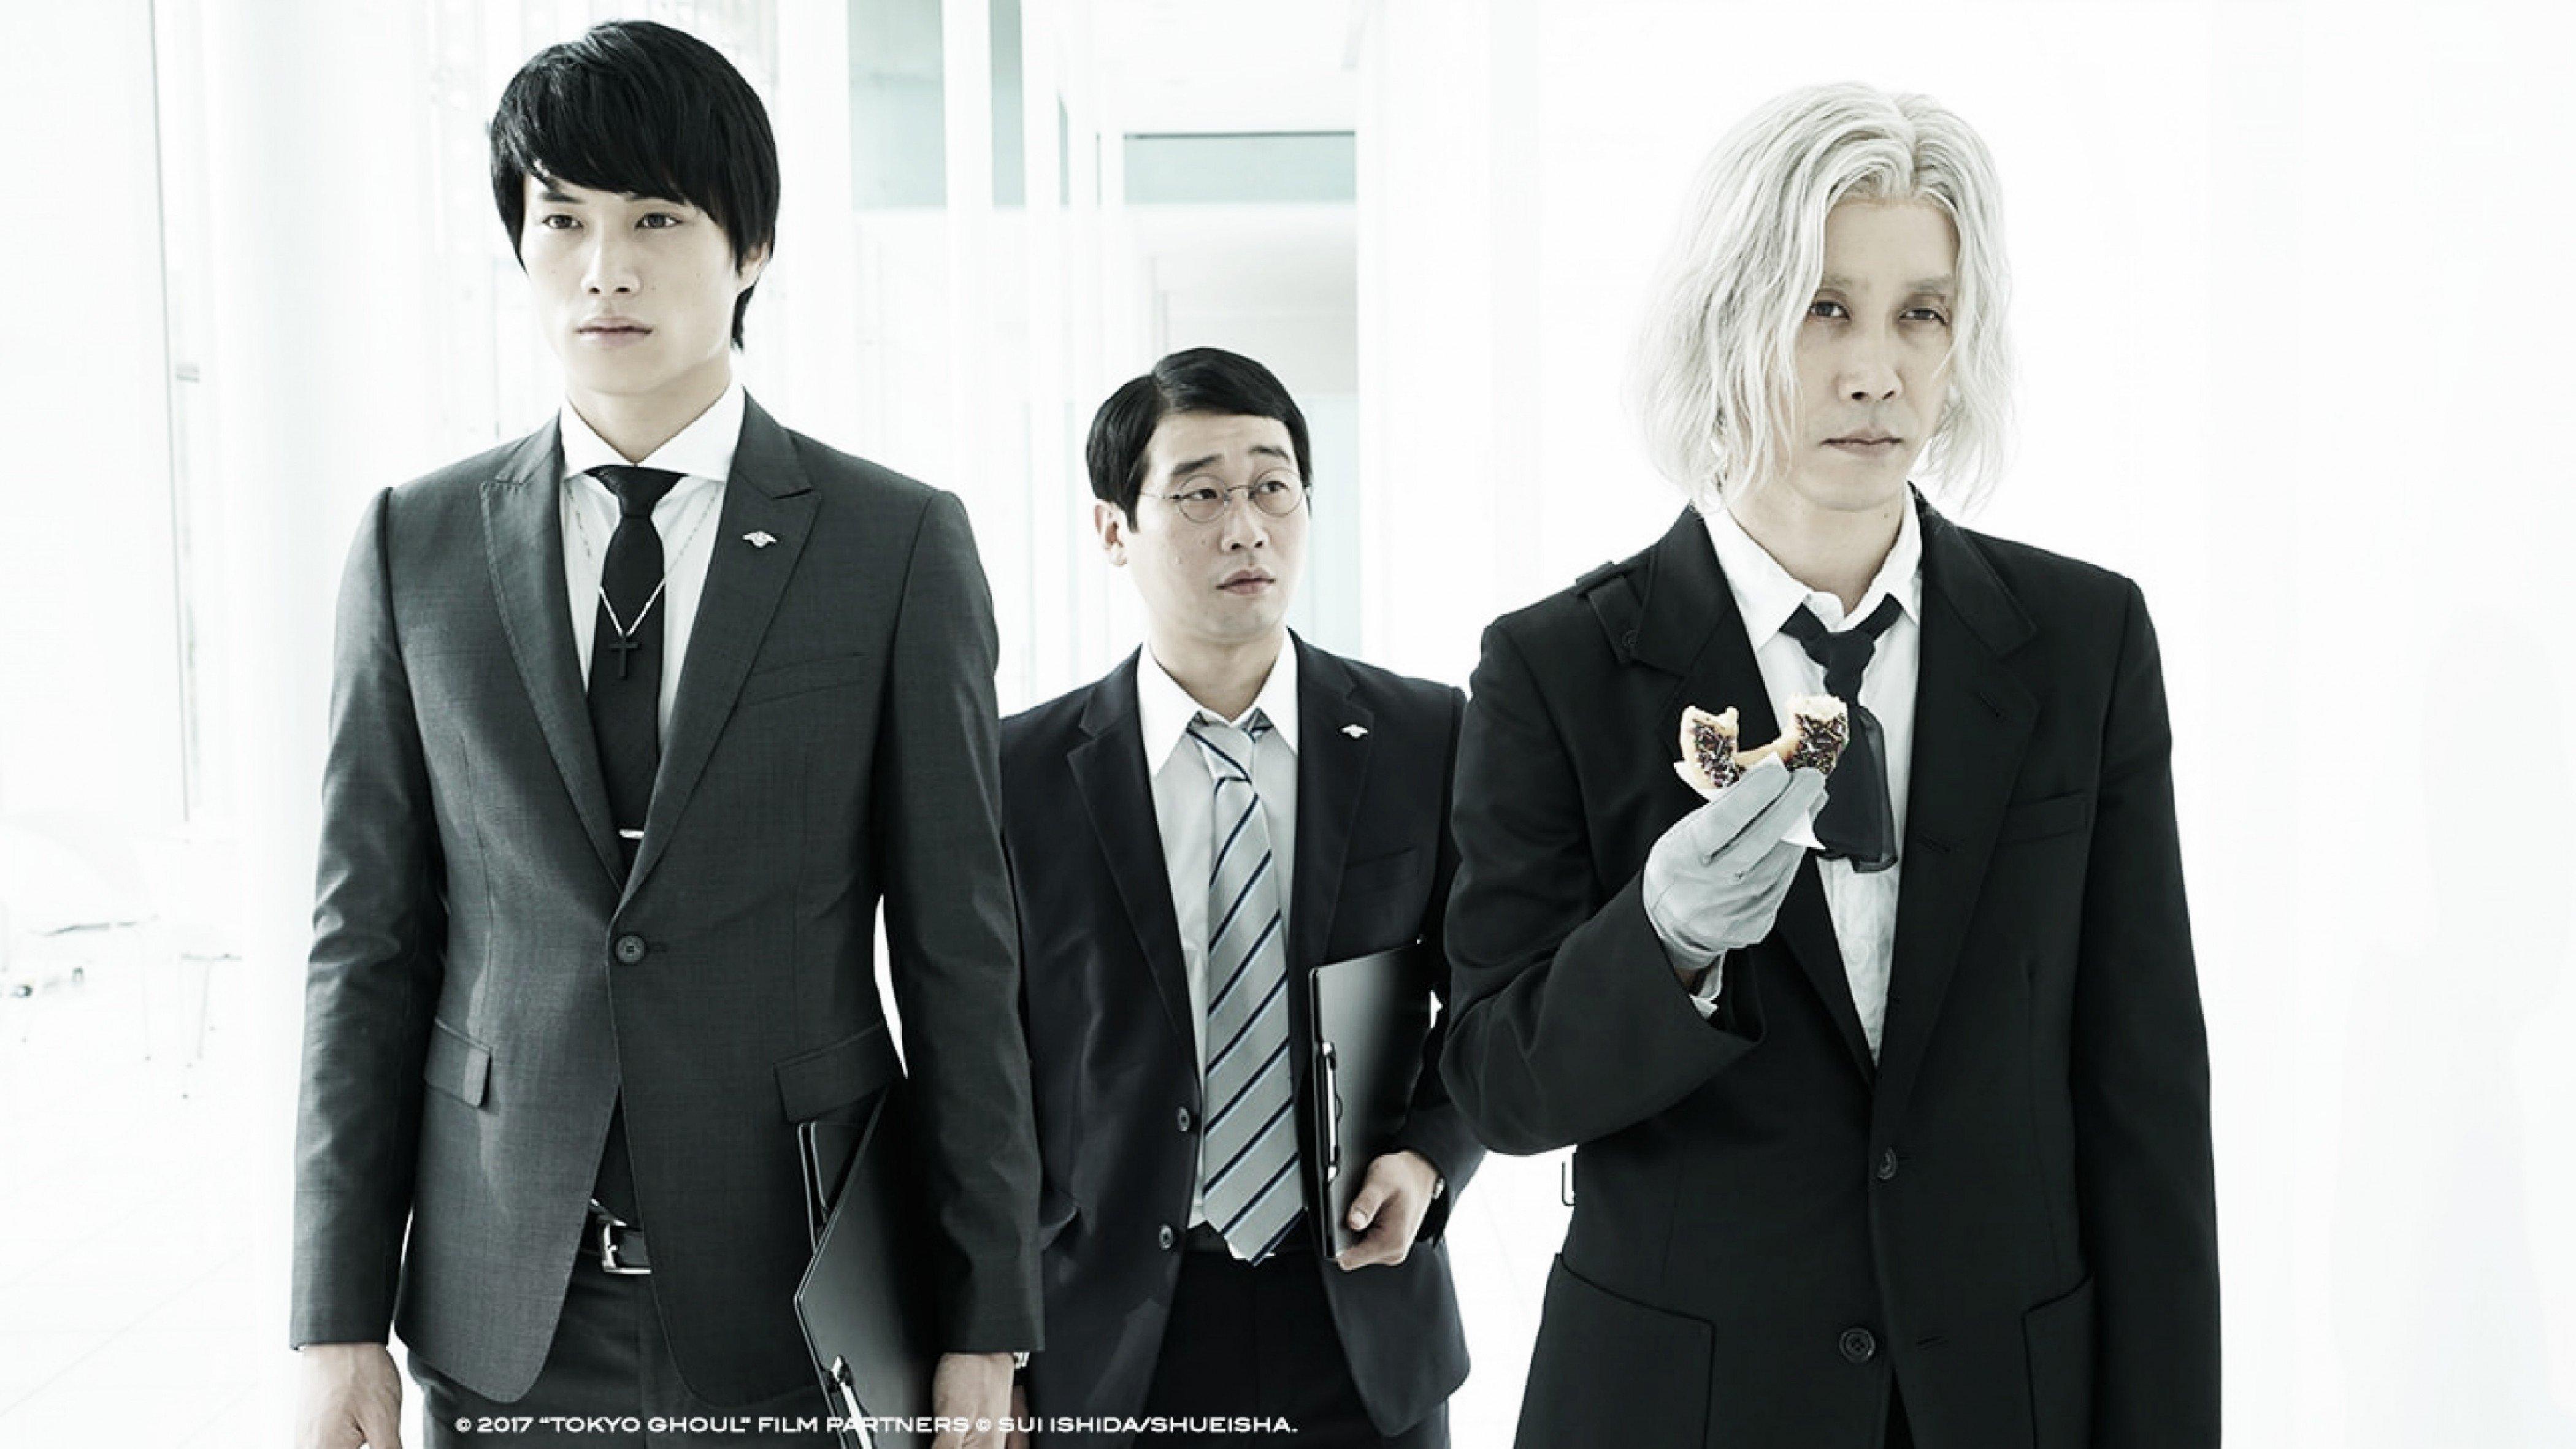 CRÍTICA | TOKYO GHOUL